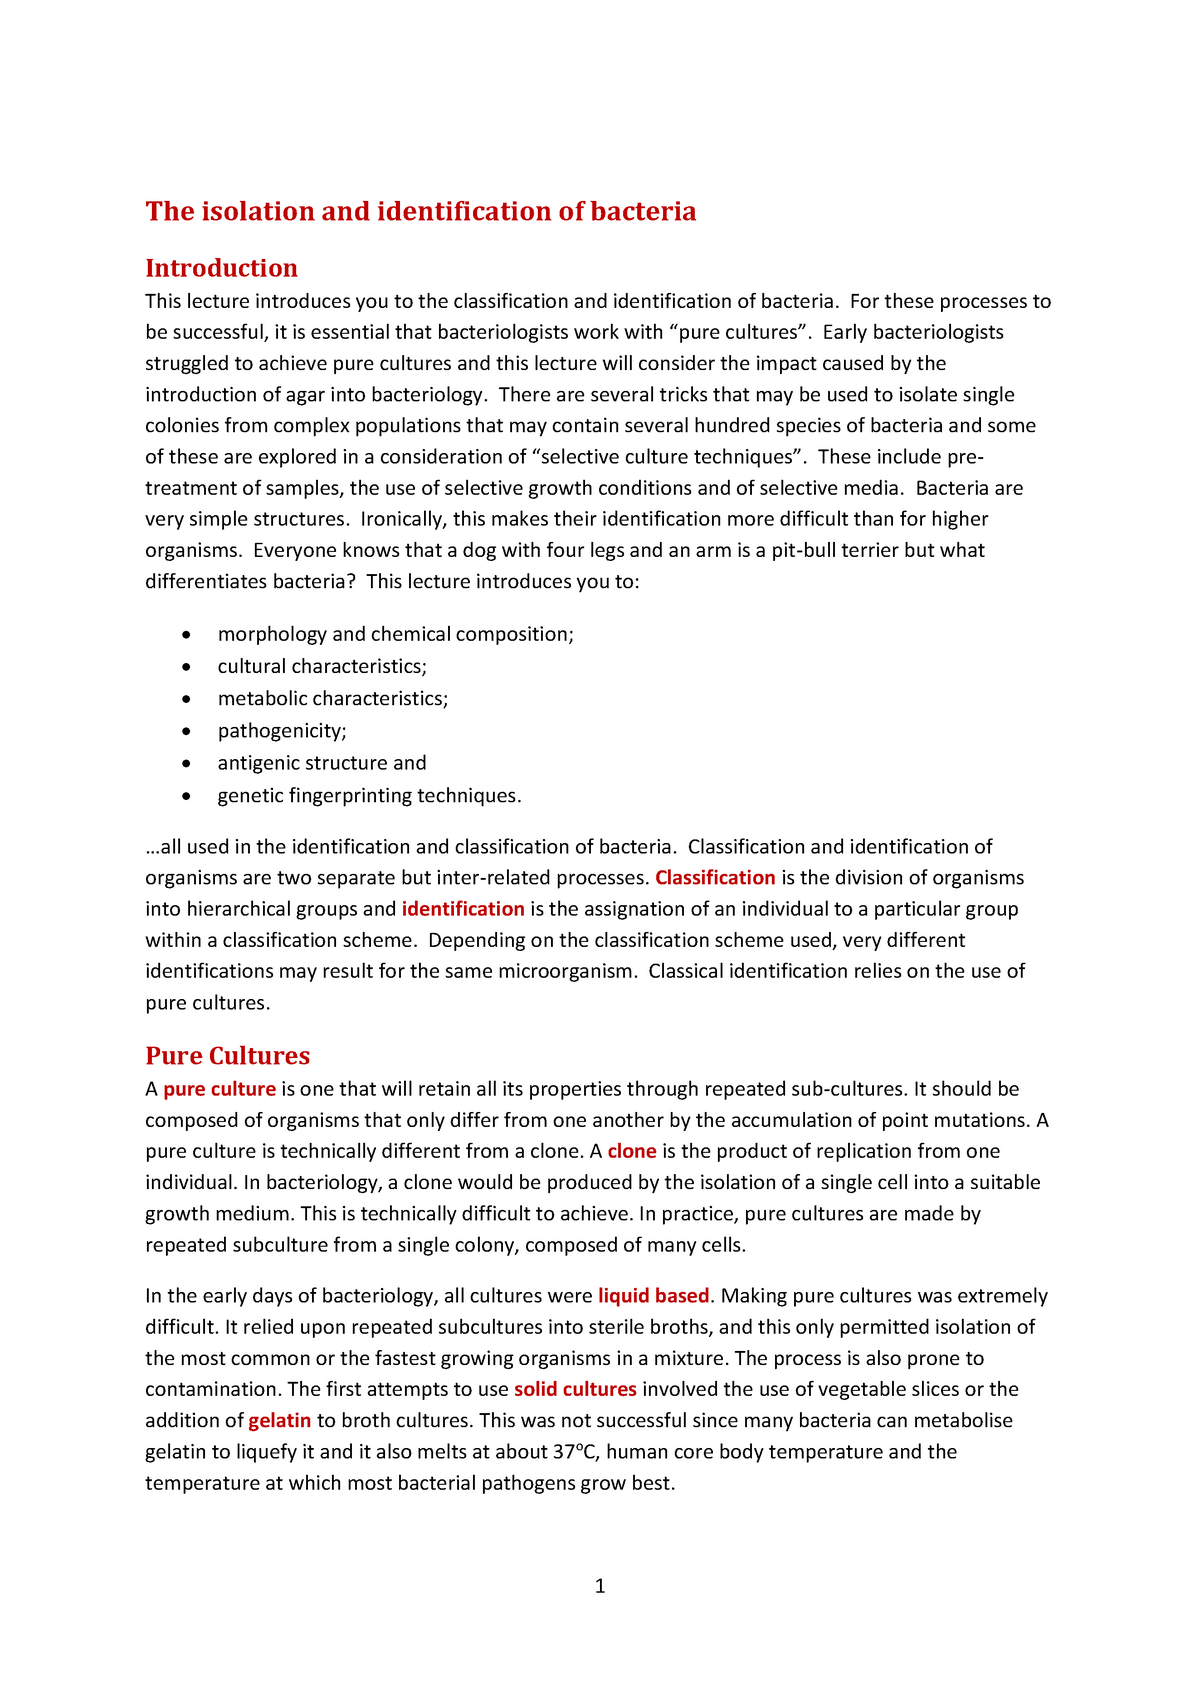 L3-Bacterial isolation and identification - - LBU - StuDocu